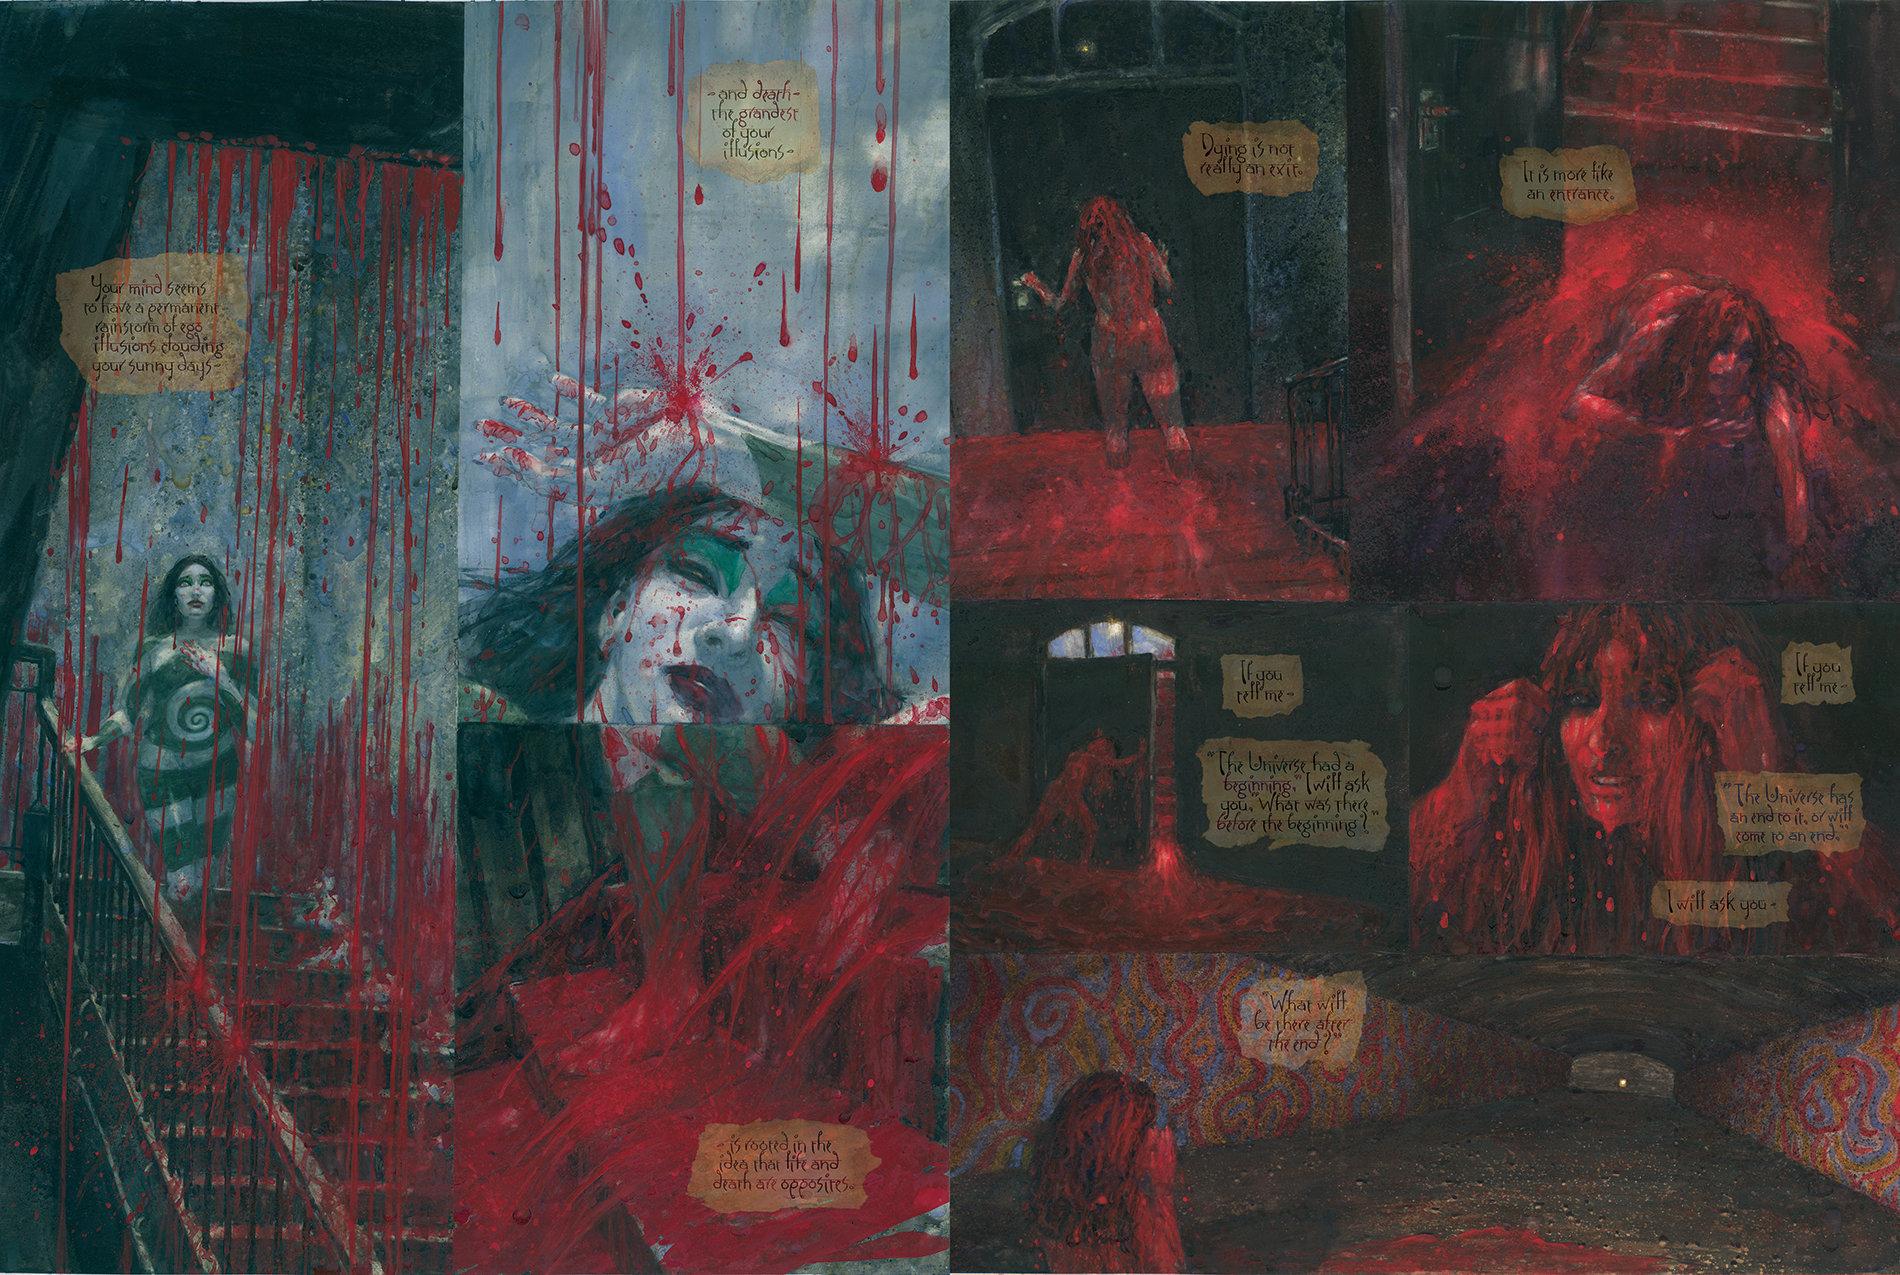 26 - Page 50-51 (rainstorm, enters red room).jpg